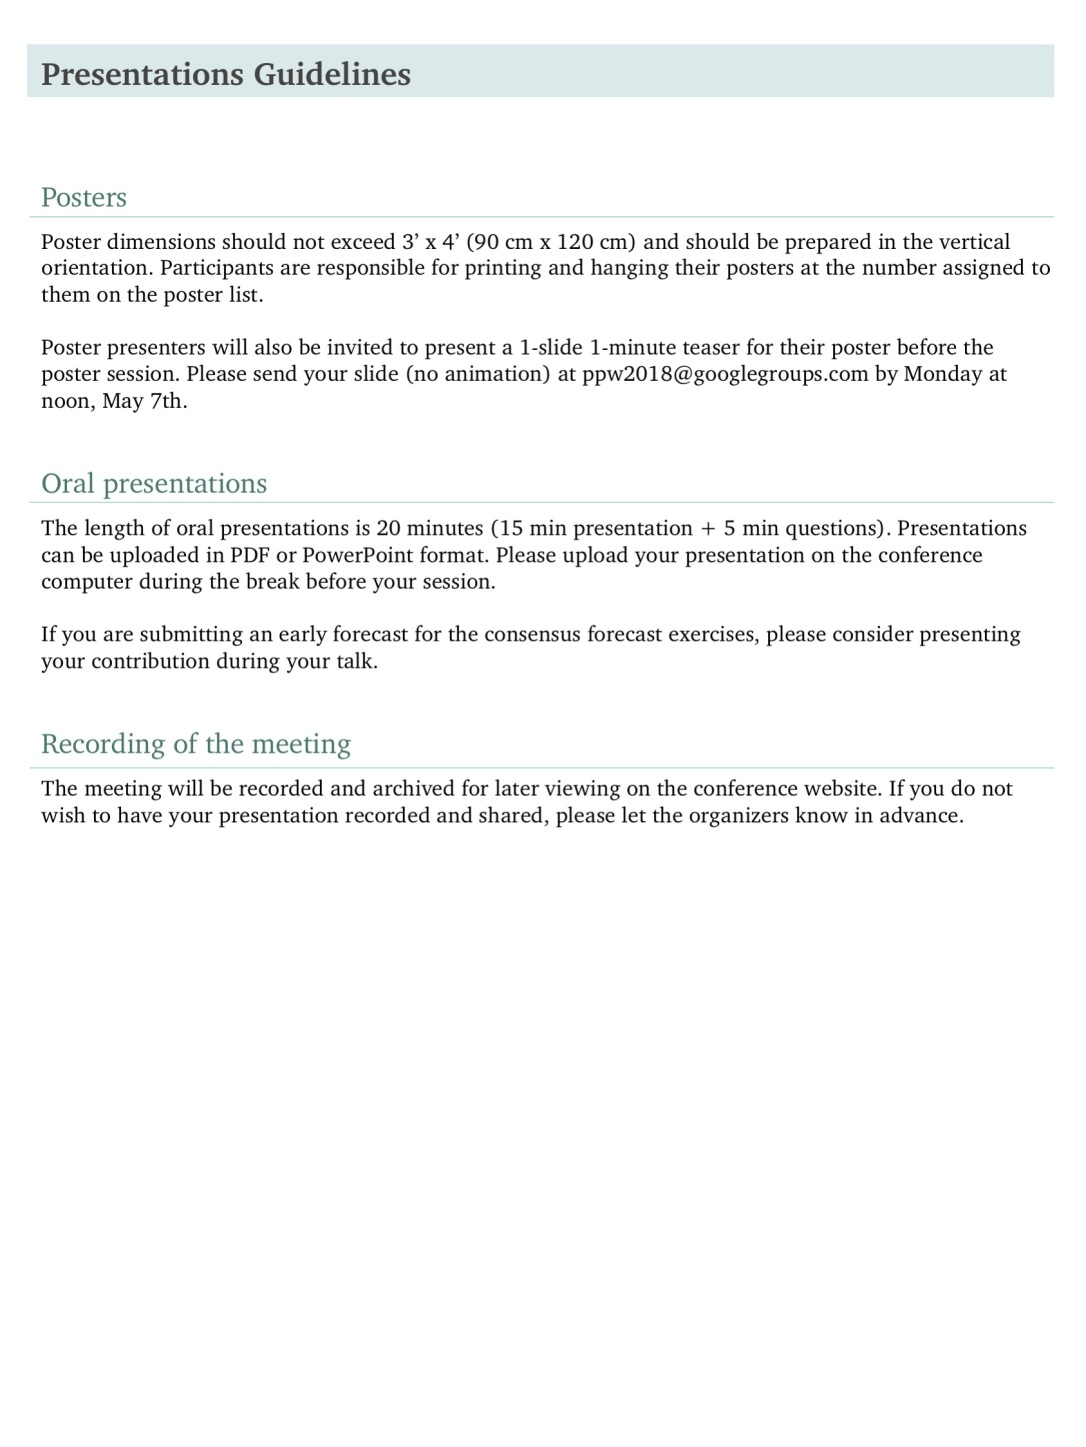 PPW2018_Agenda_FINAL4.jpg